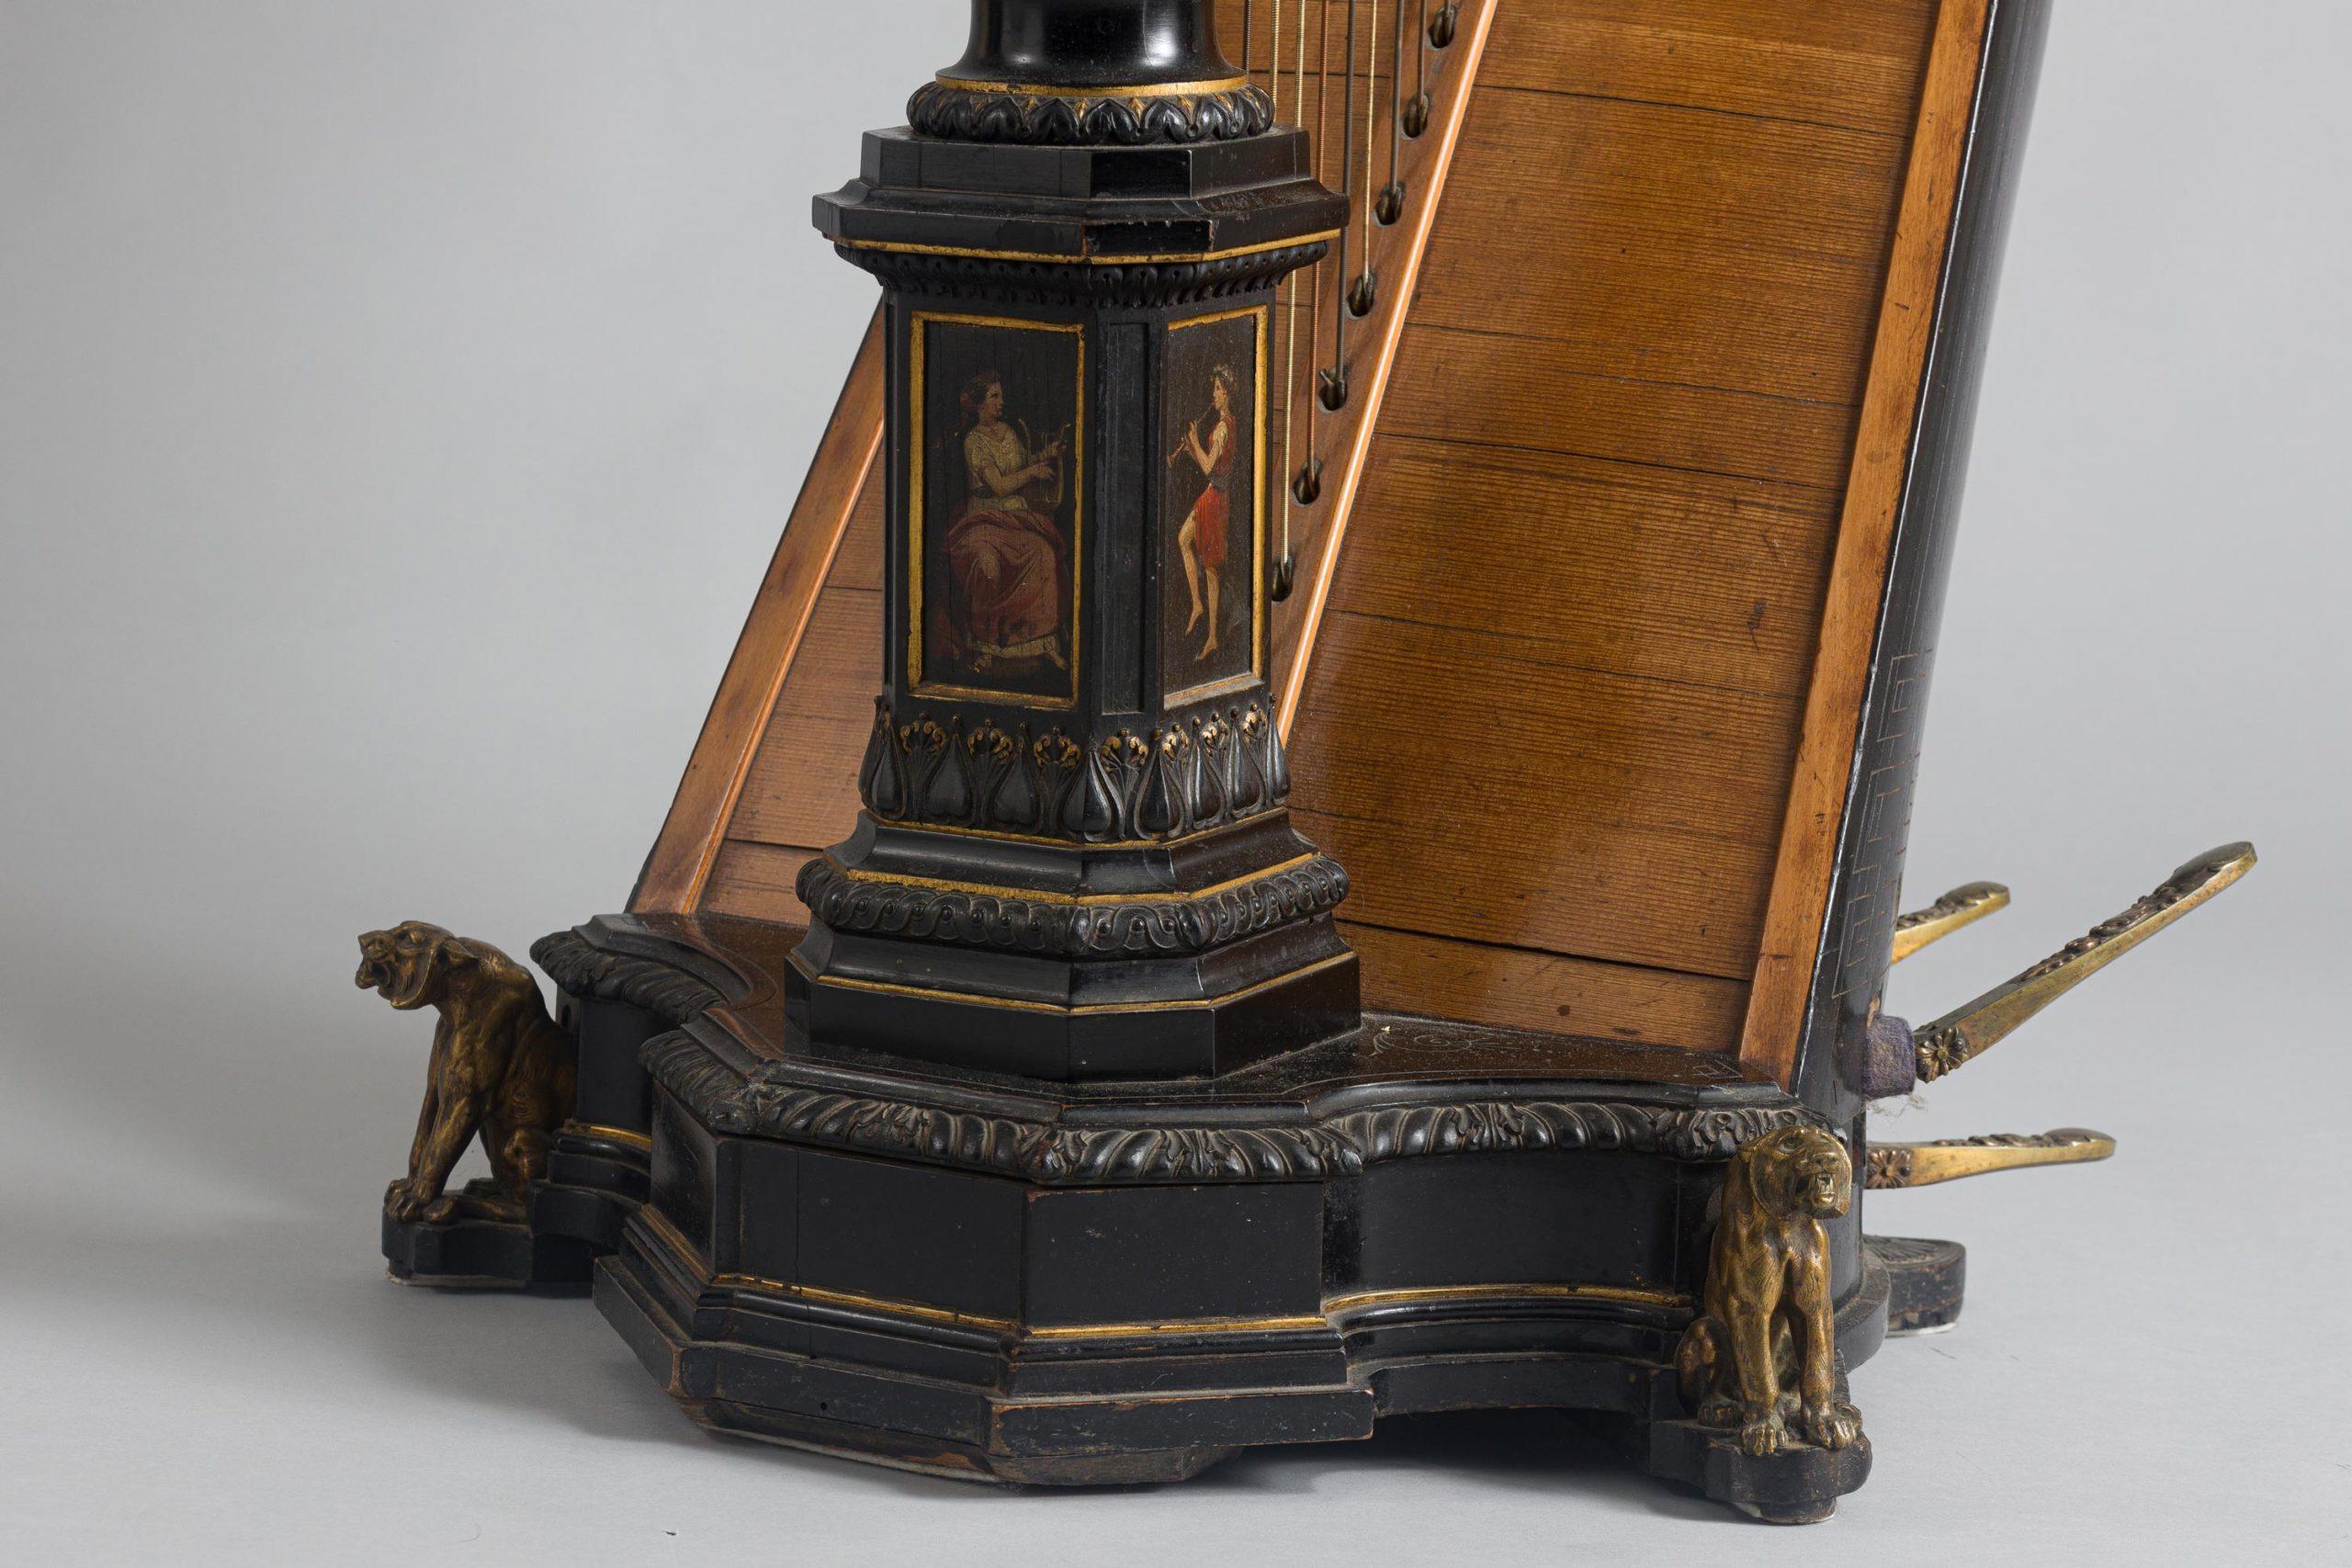 Harpe ERARD de style néo-grec, 1873